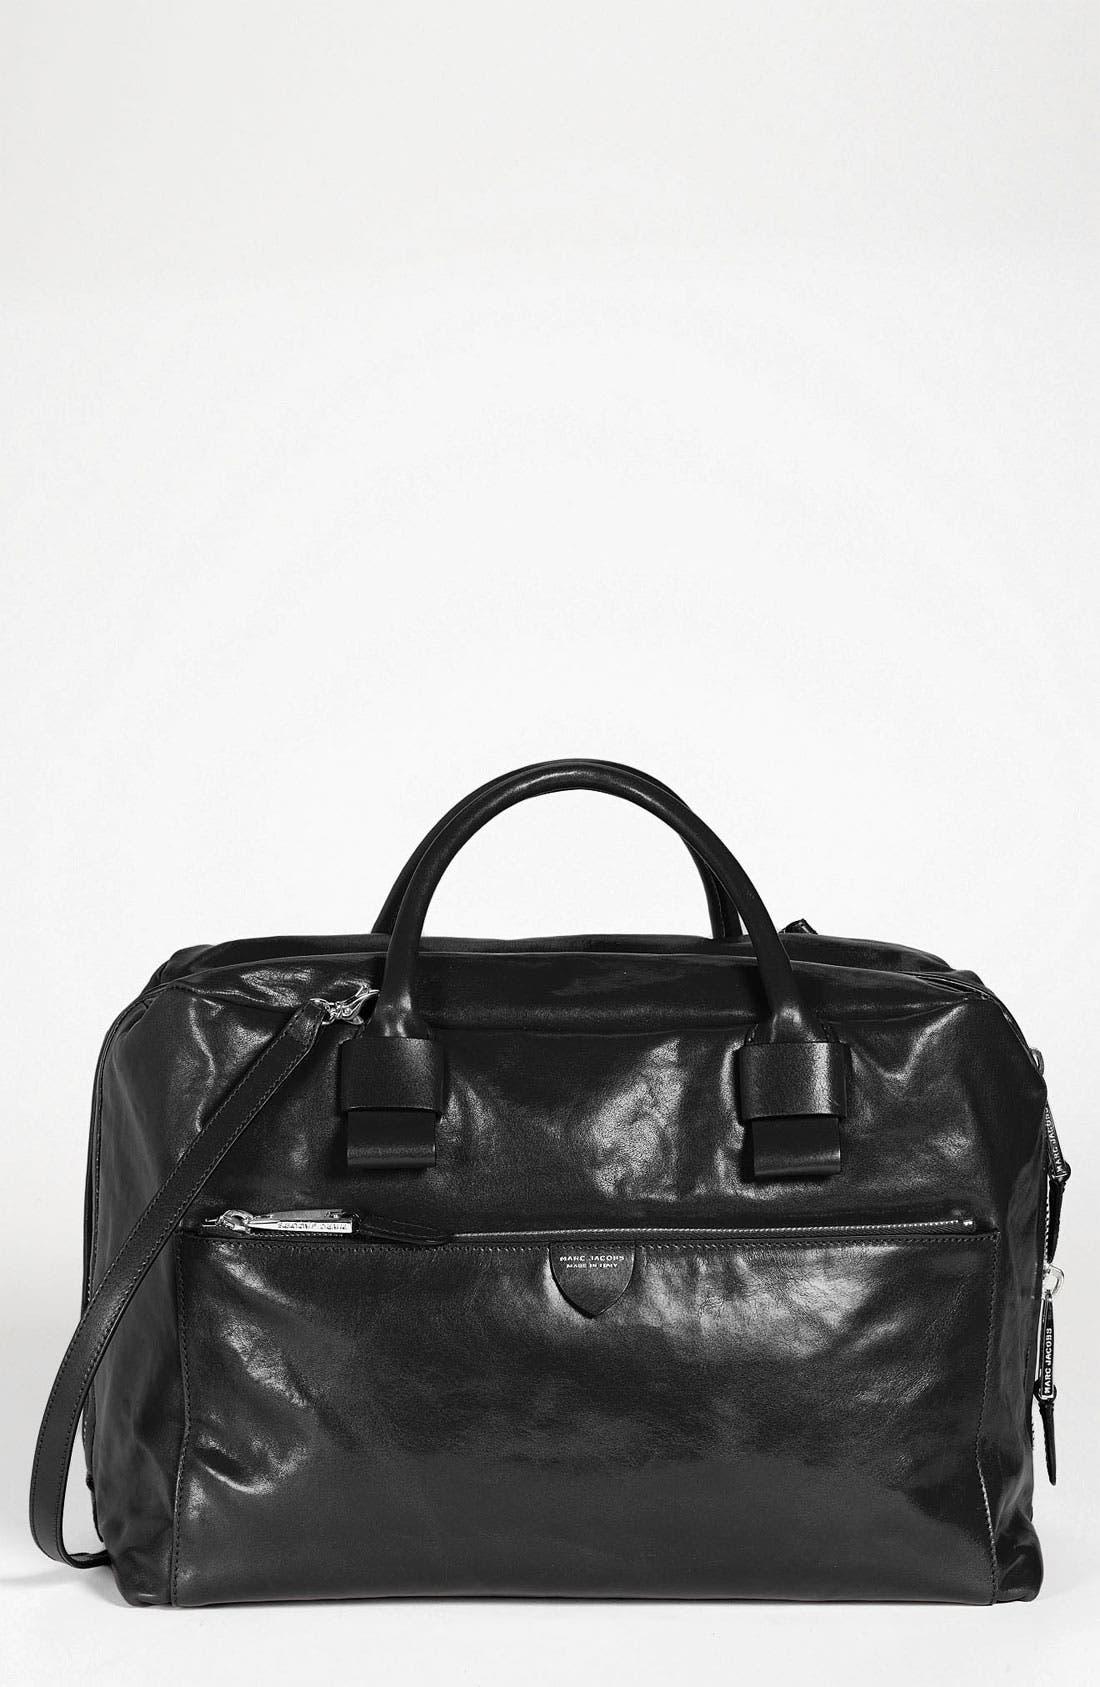 Main Image - MARC JACOBS 'Antonia'  Leather Satchel